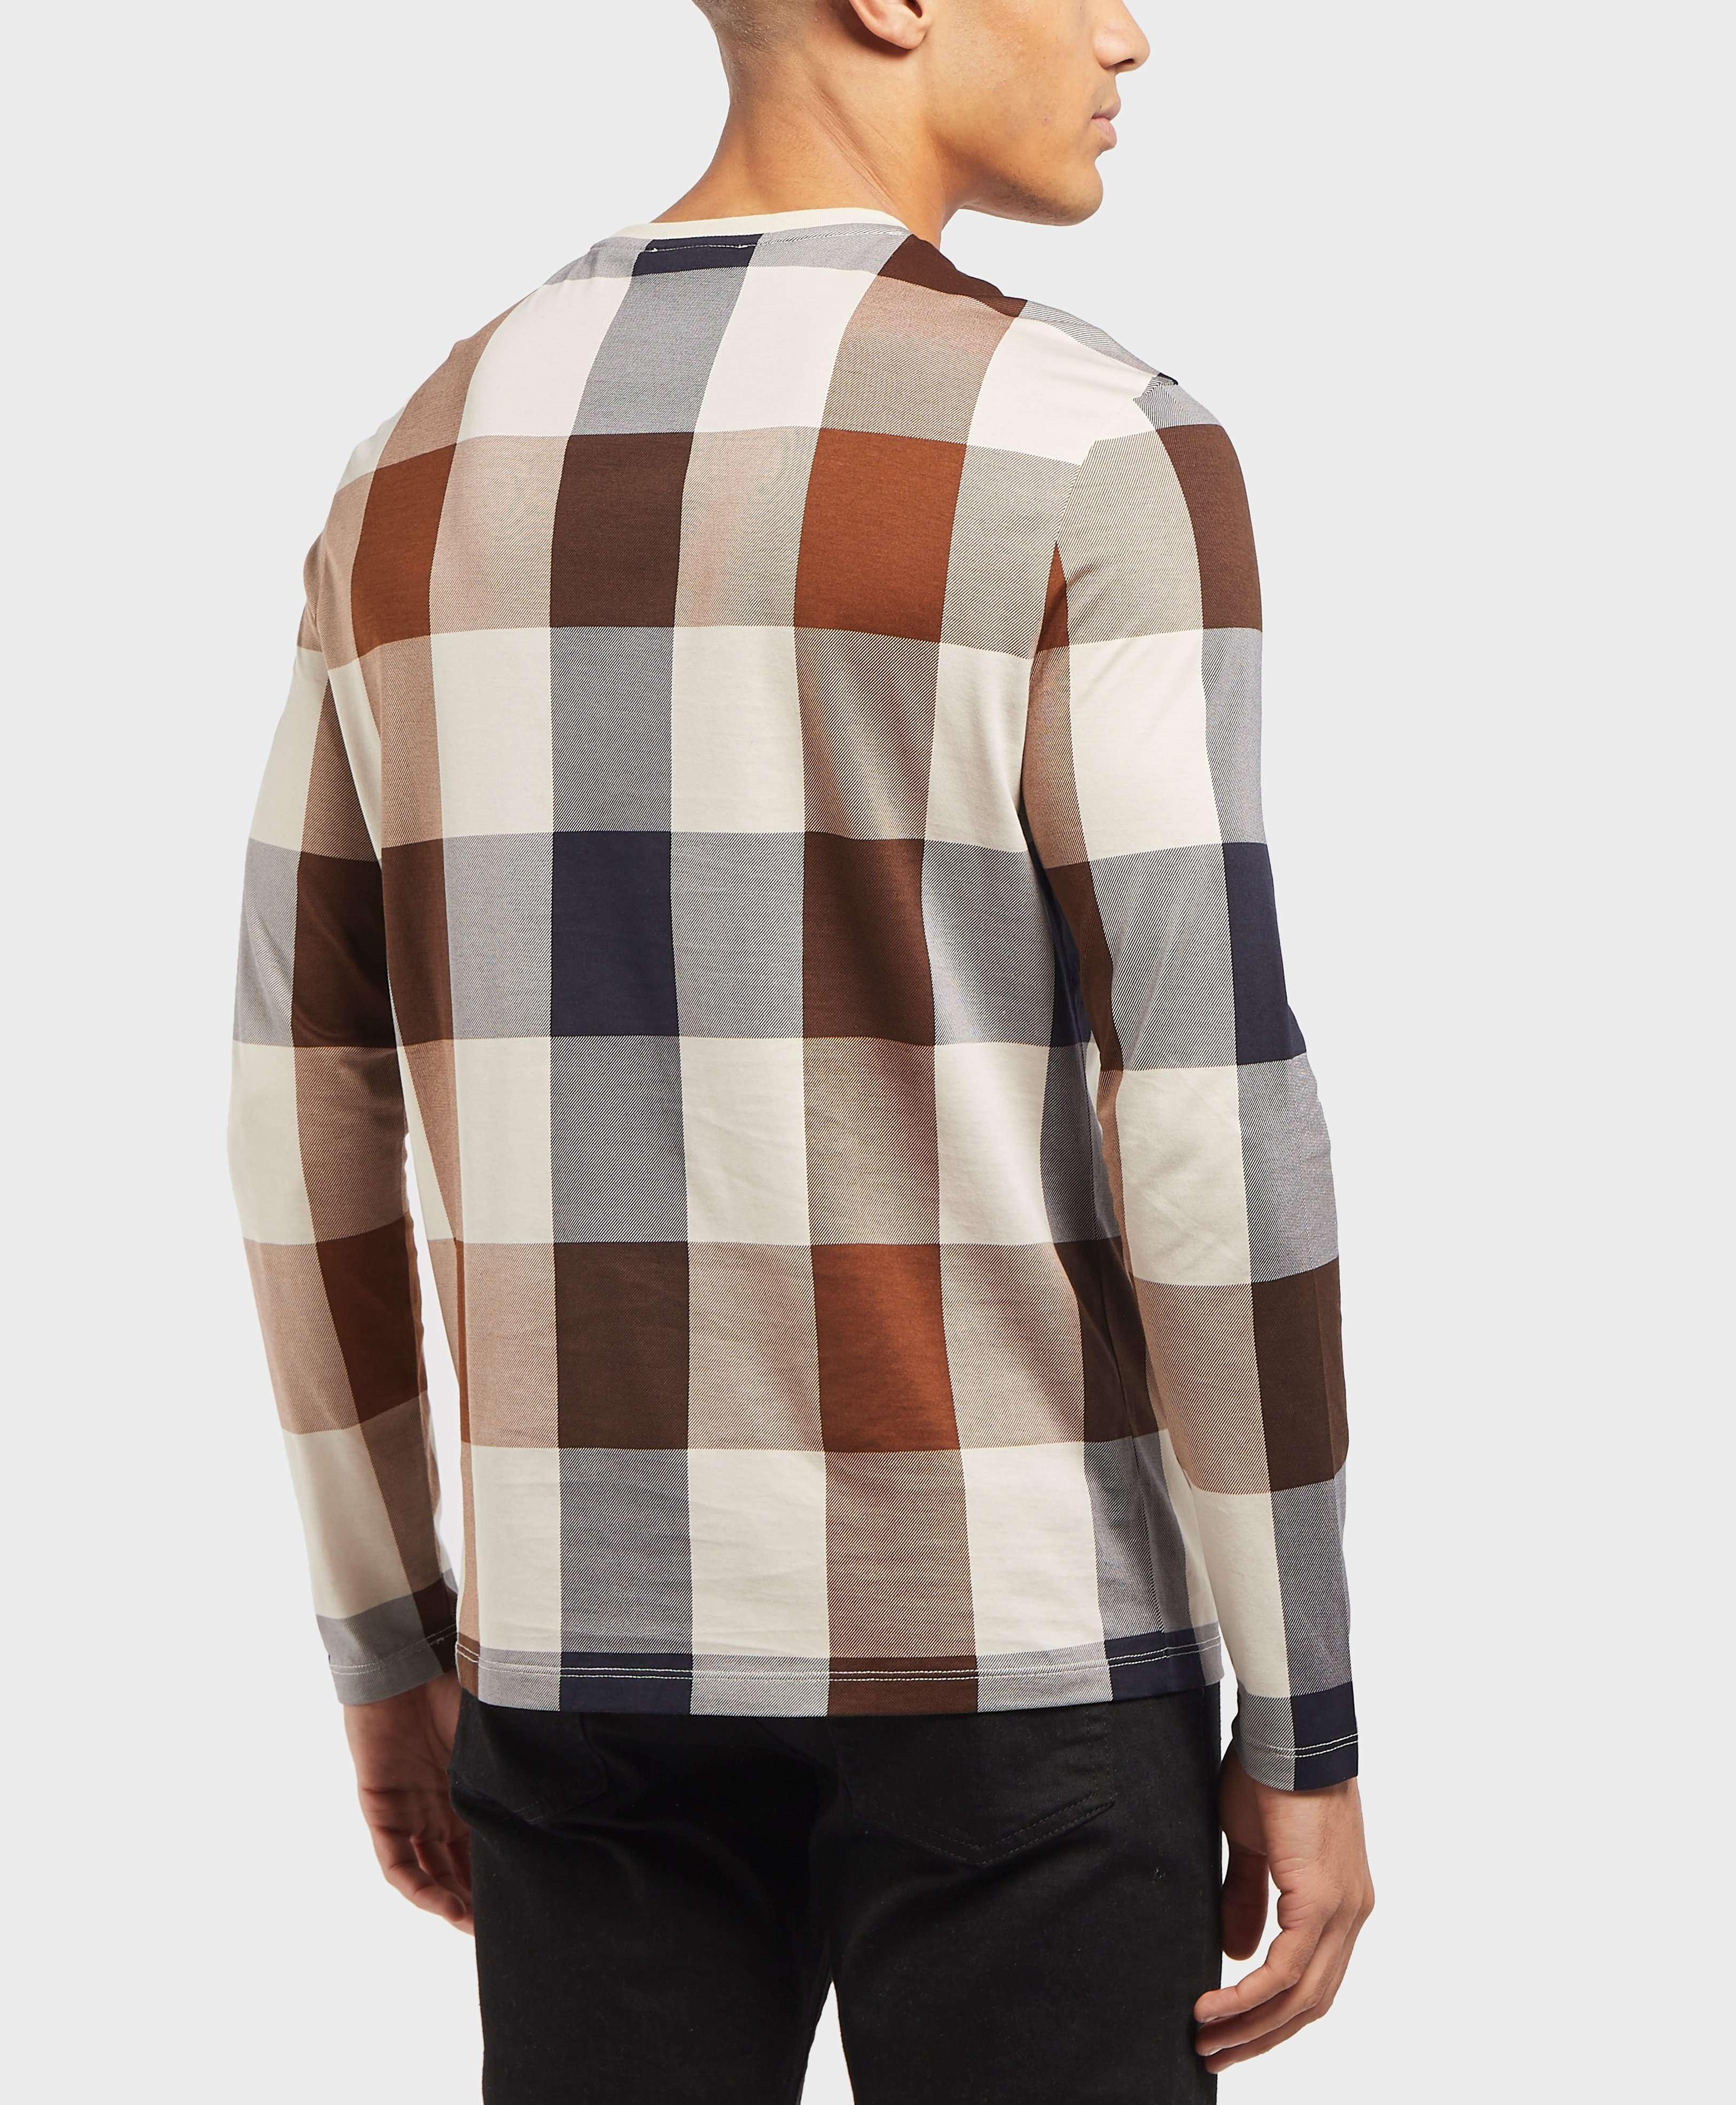 Aquascutum Oversized Check Long Sleeve T-Shirt